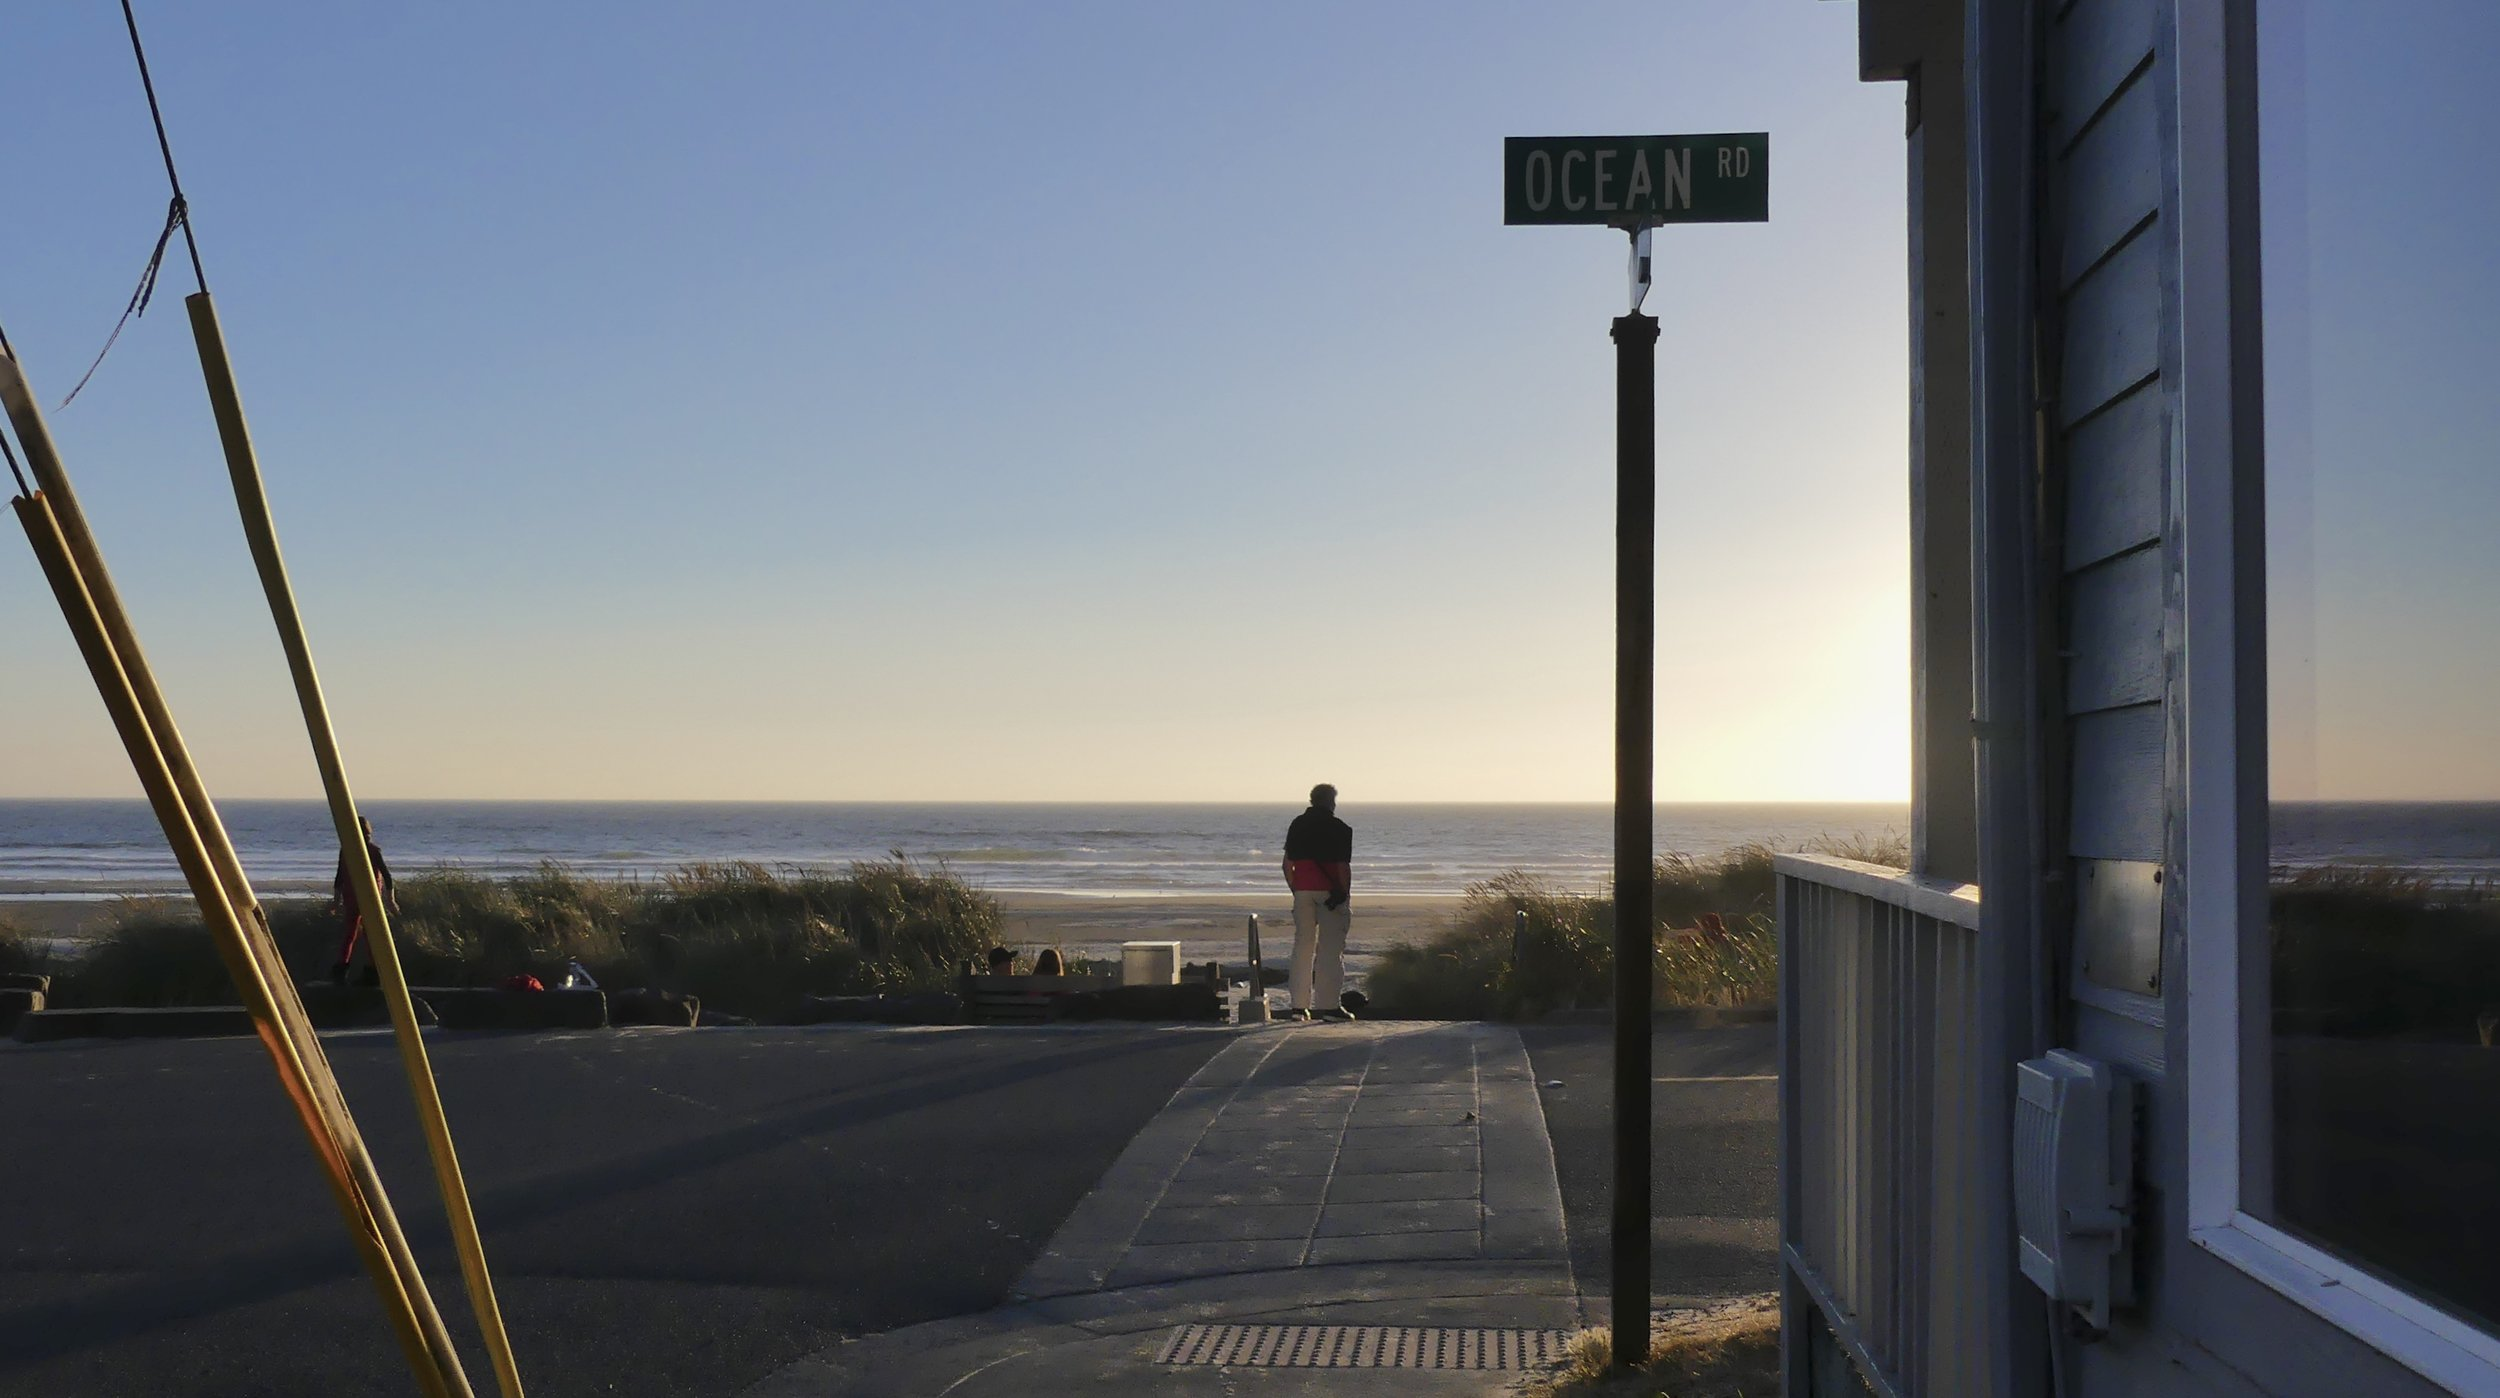 Man surveys the ocean